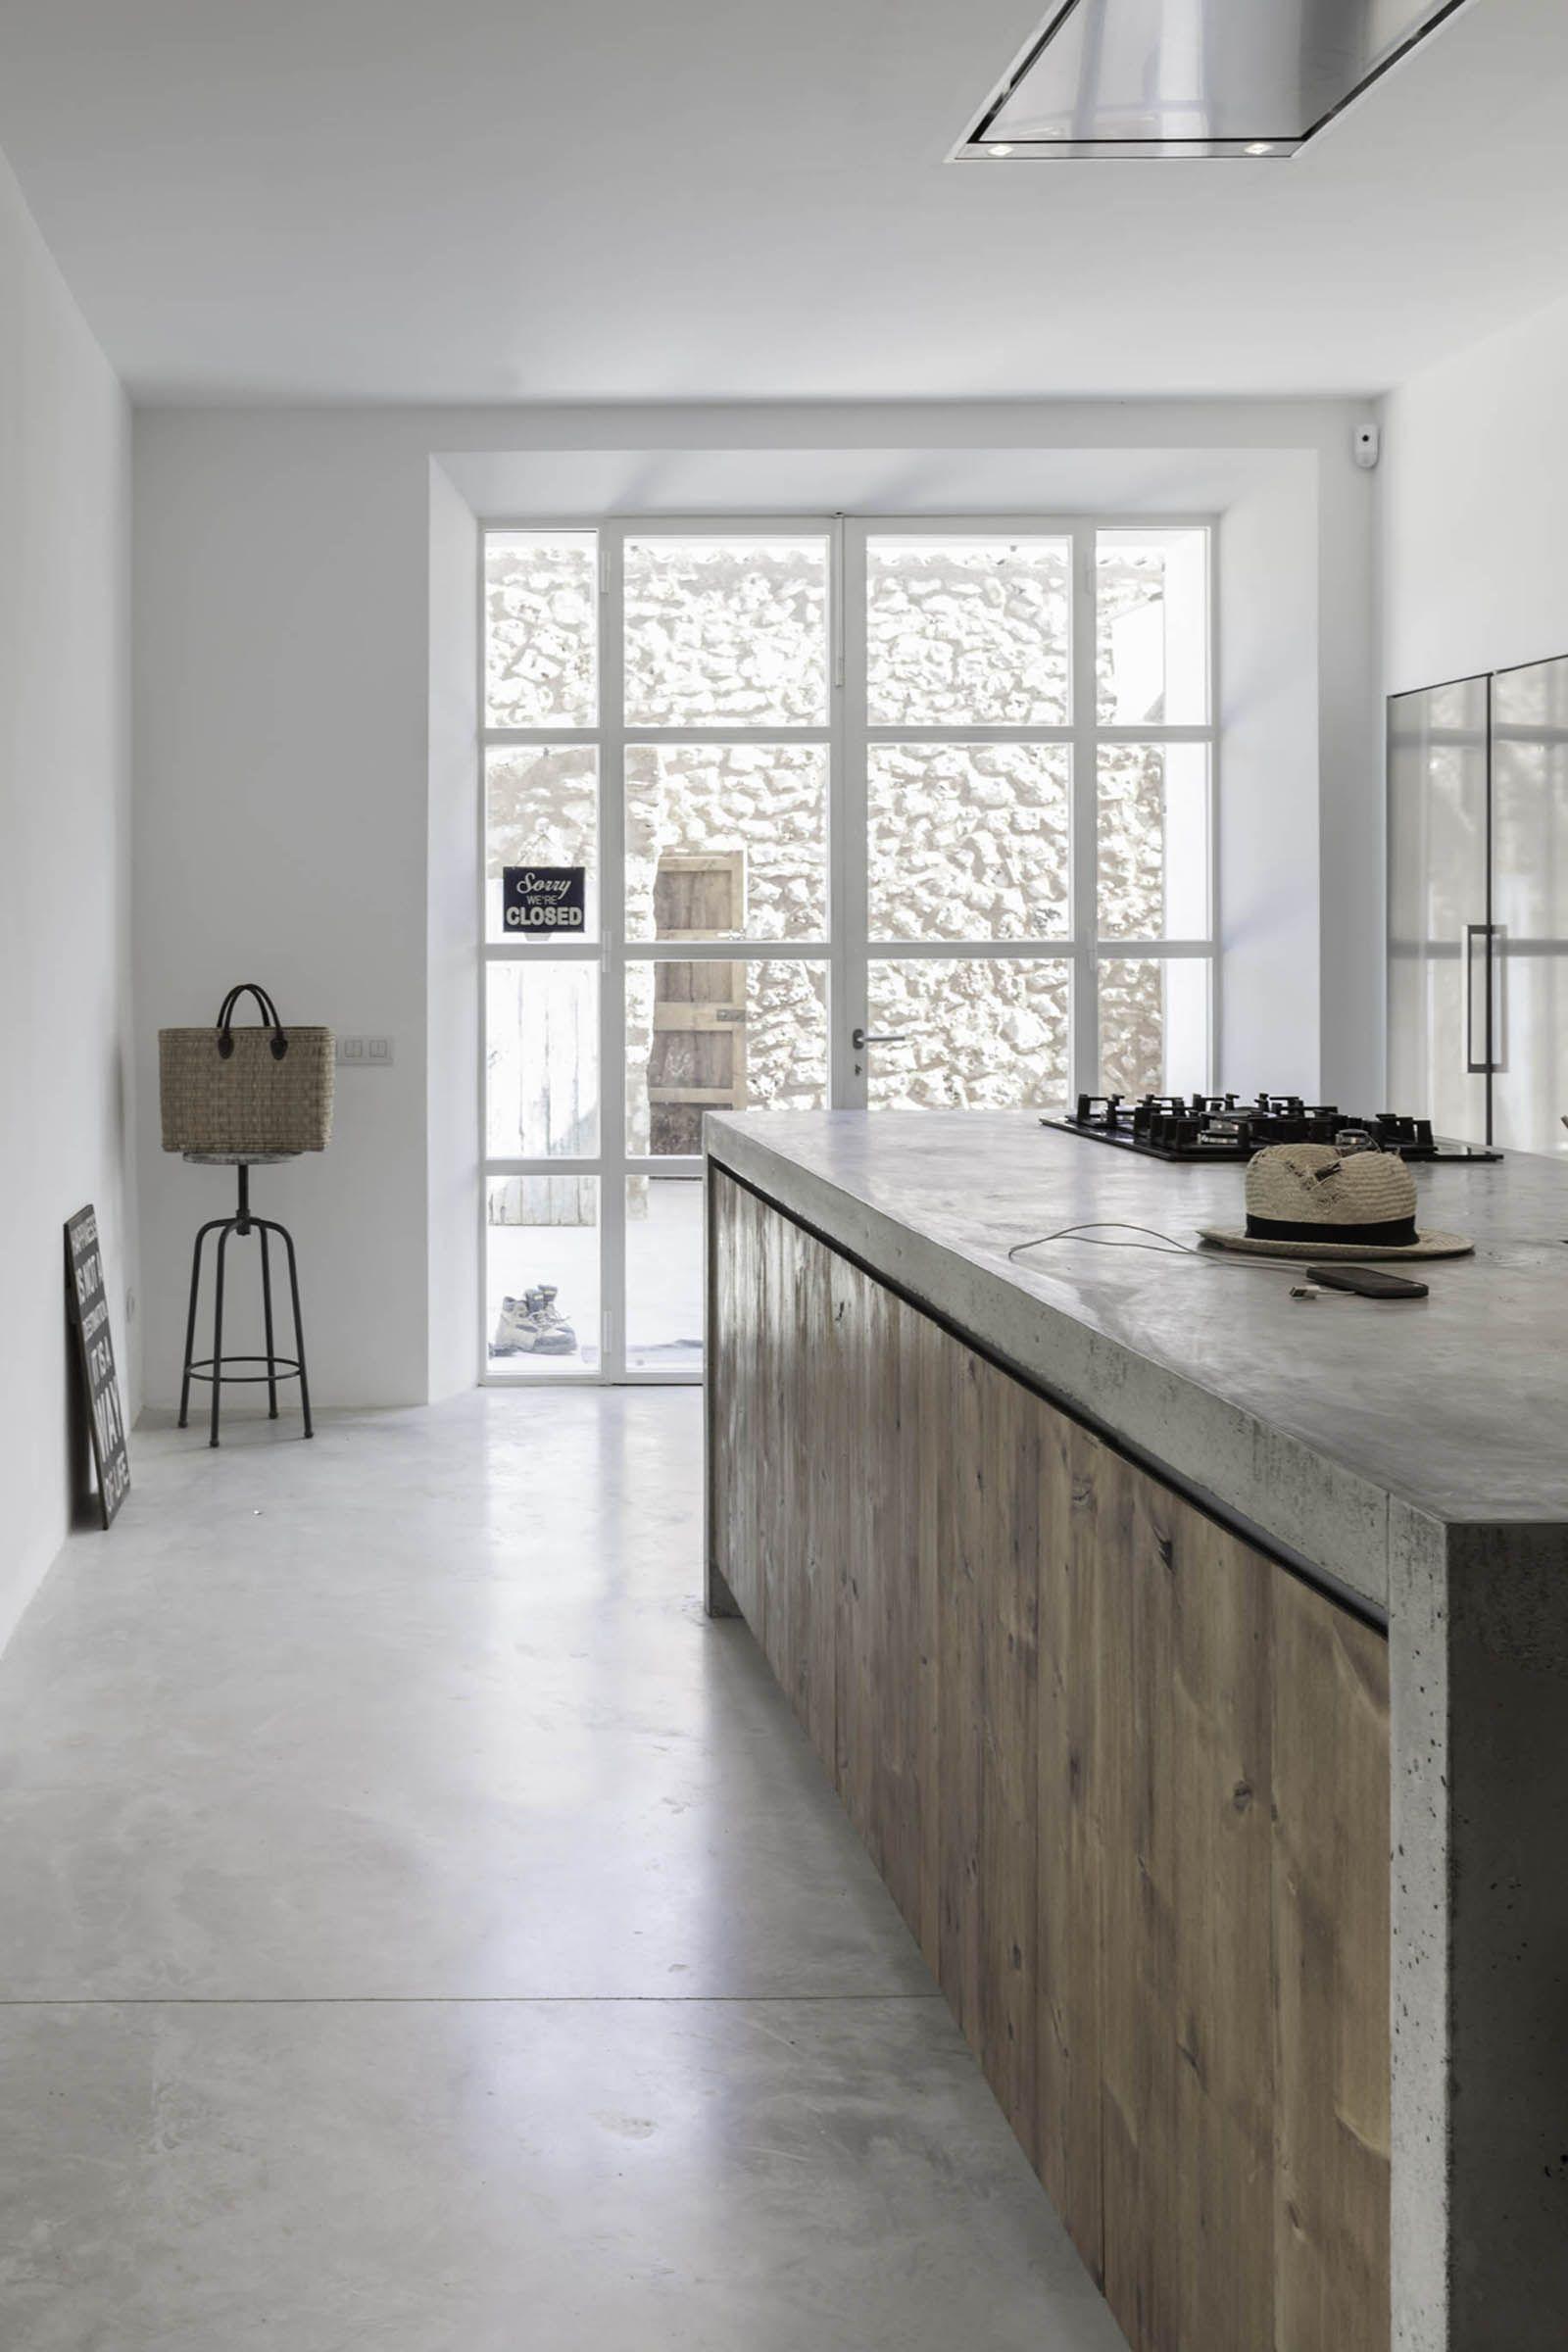 Isla Cocina alternativa fusion | Kitchen ideas | Pinterest | Cocinas ...